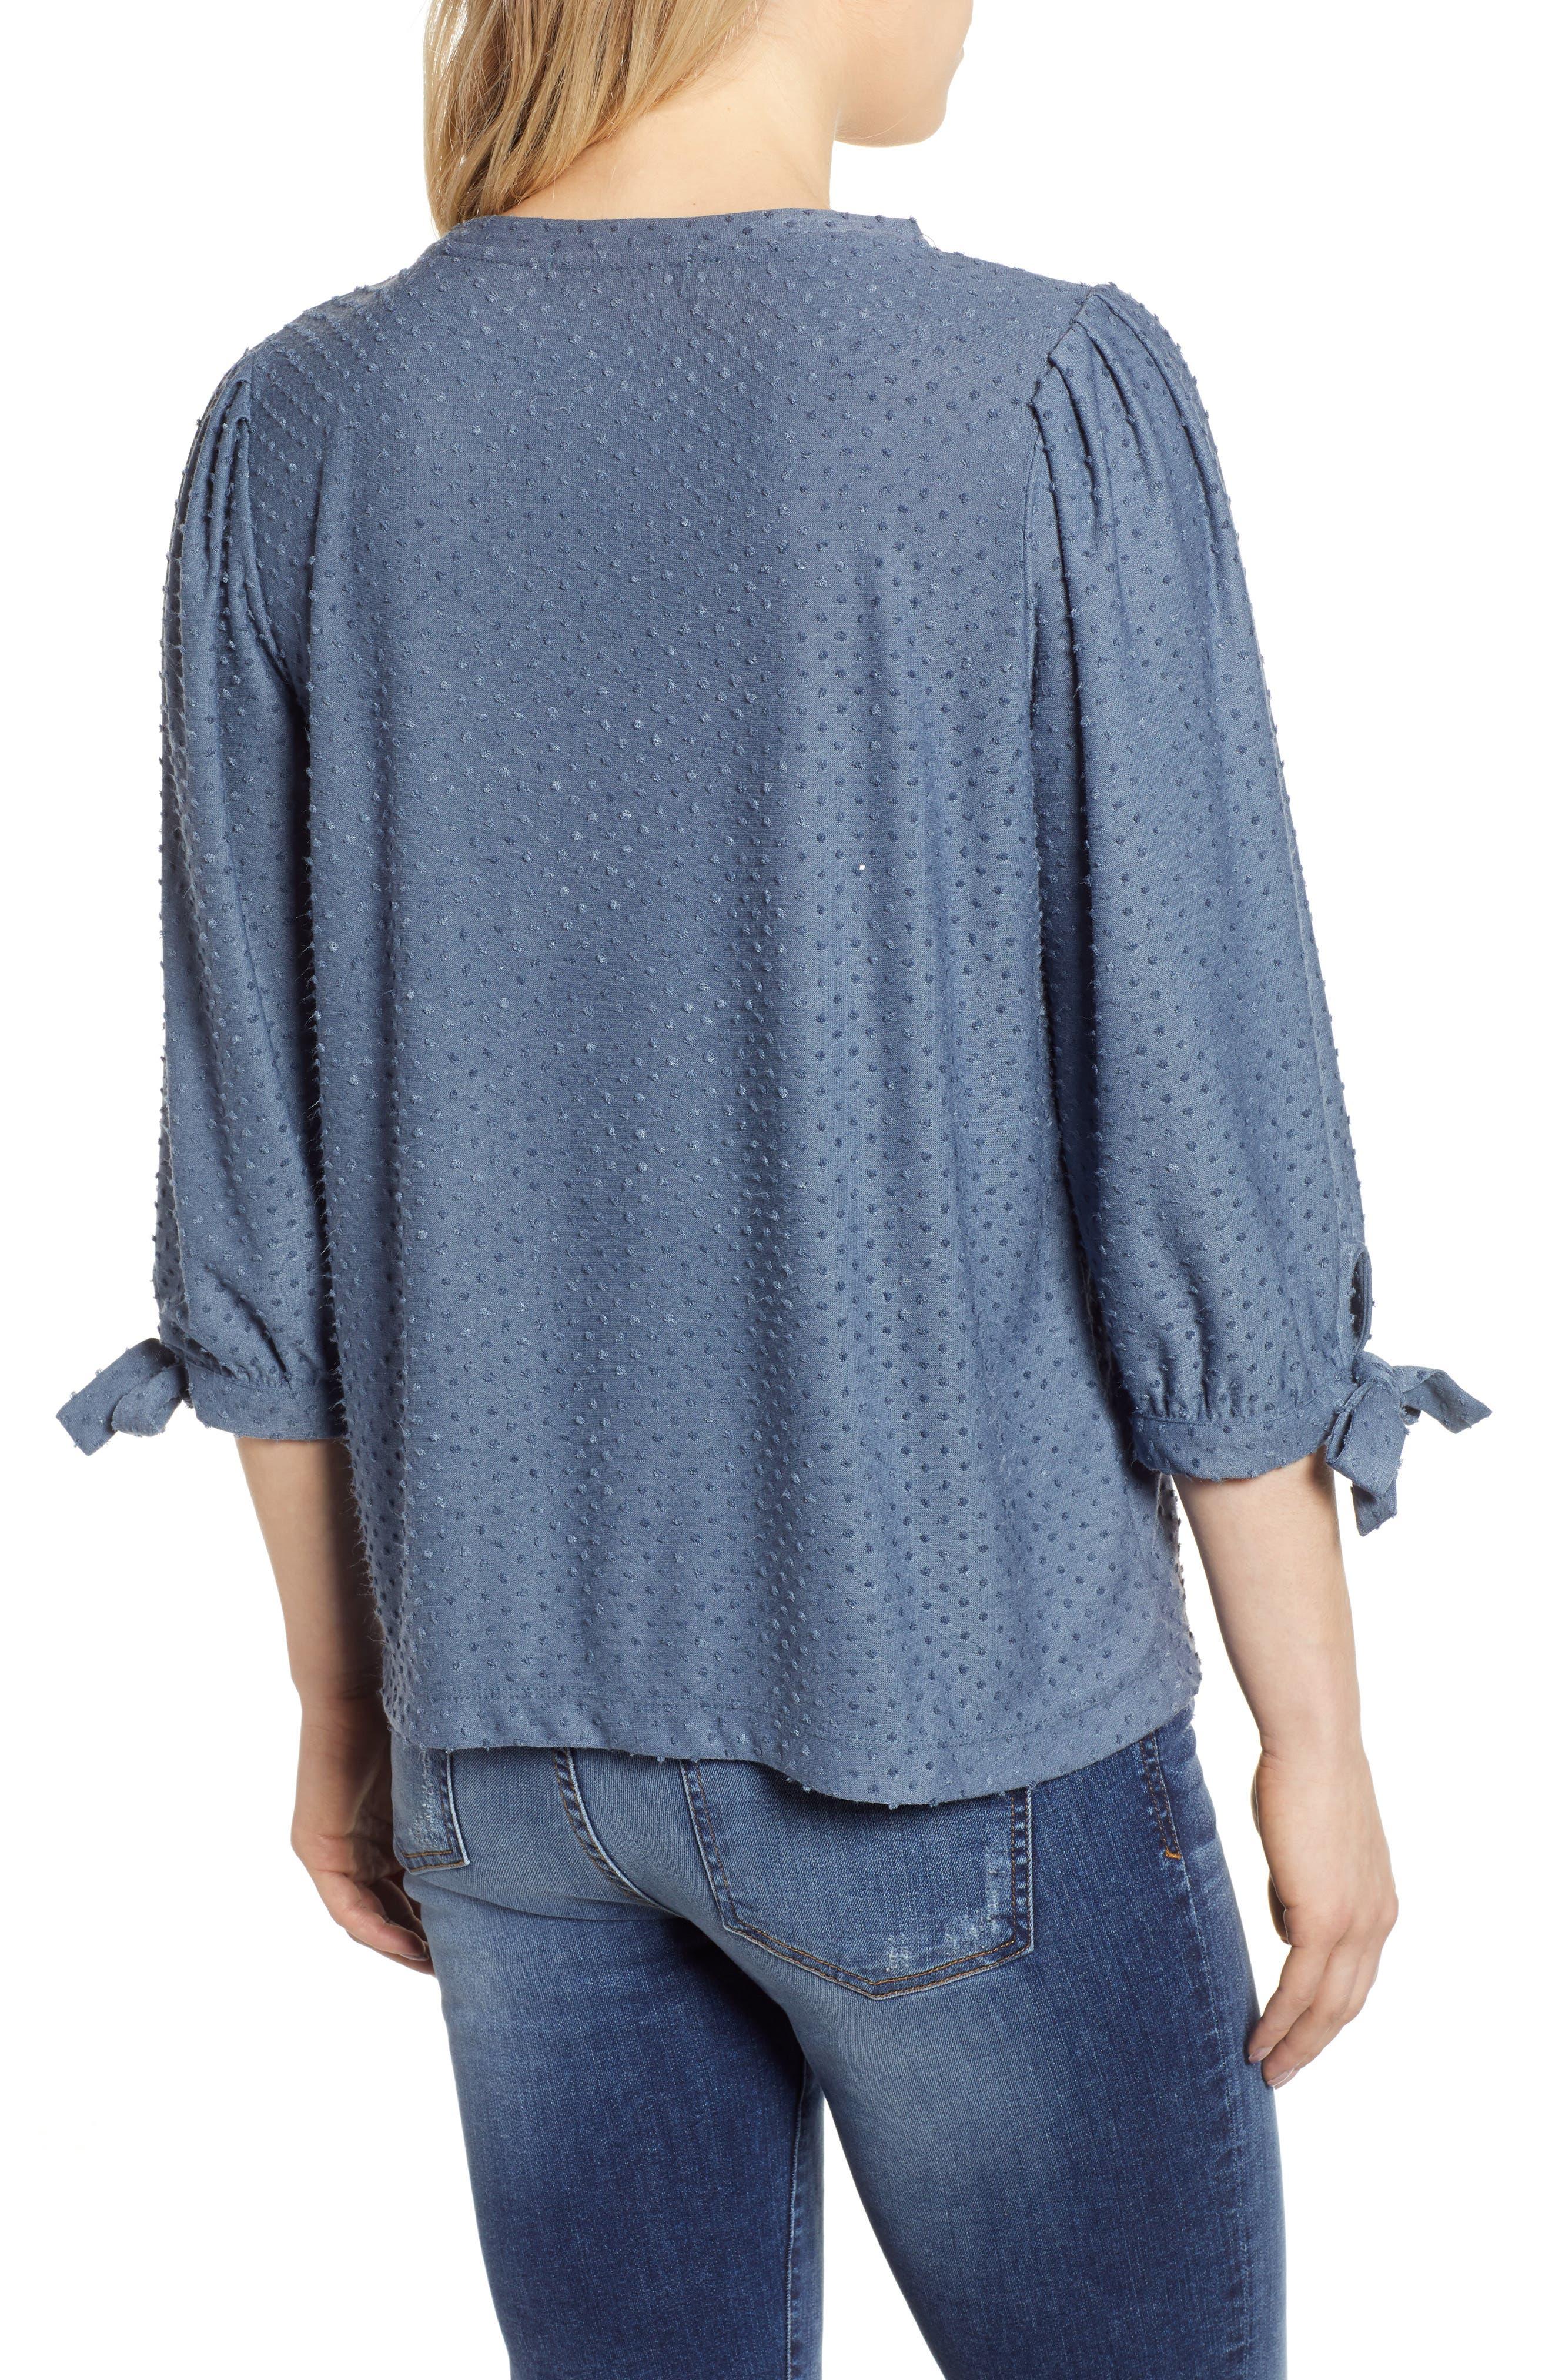 GIBSON, x International Women's Day Ruthie Clip Dot Tie Sleeve Blouse, Alternate thumbnail 2, color, DENIM